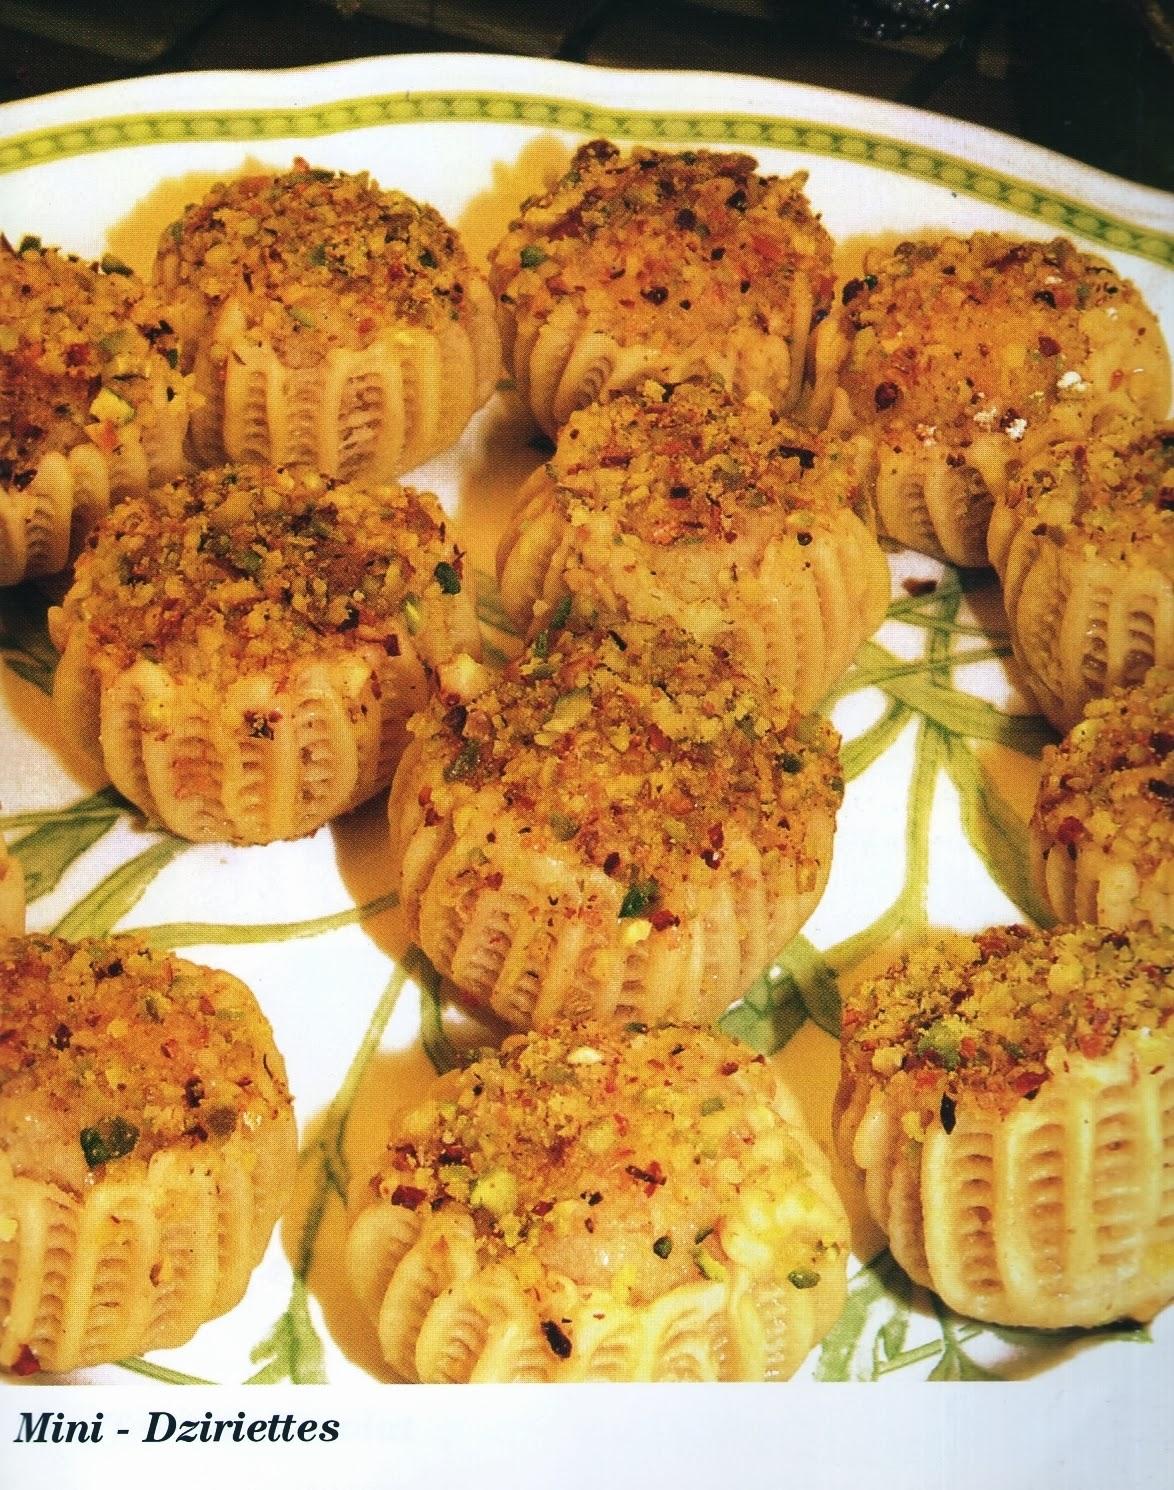 Decoration De Cuisine Algerienne : Ophrey decoration cuisine algerienne prélèvement d